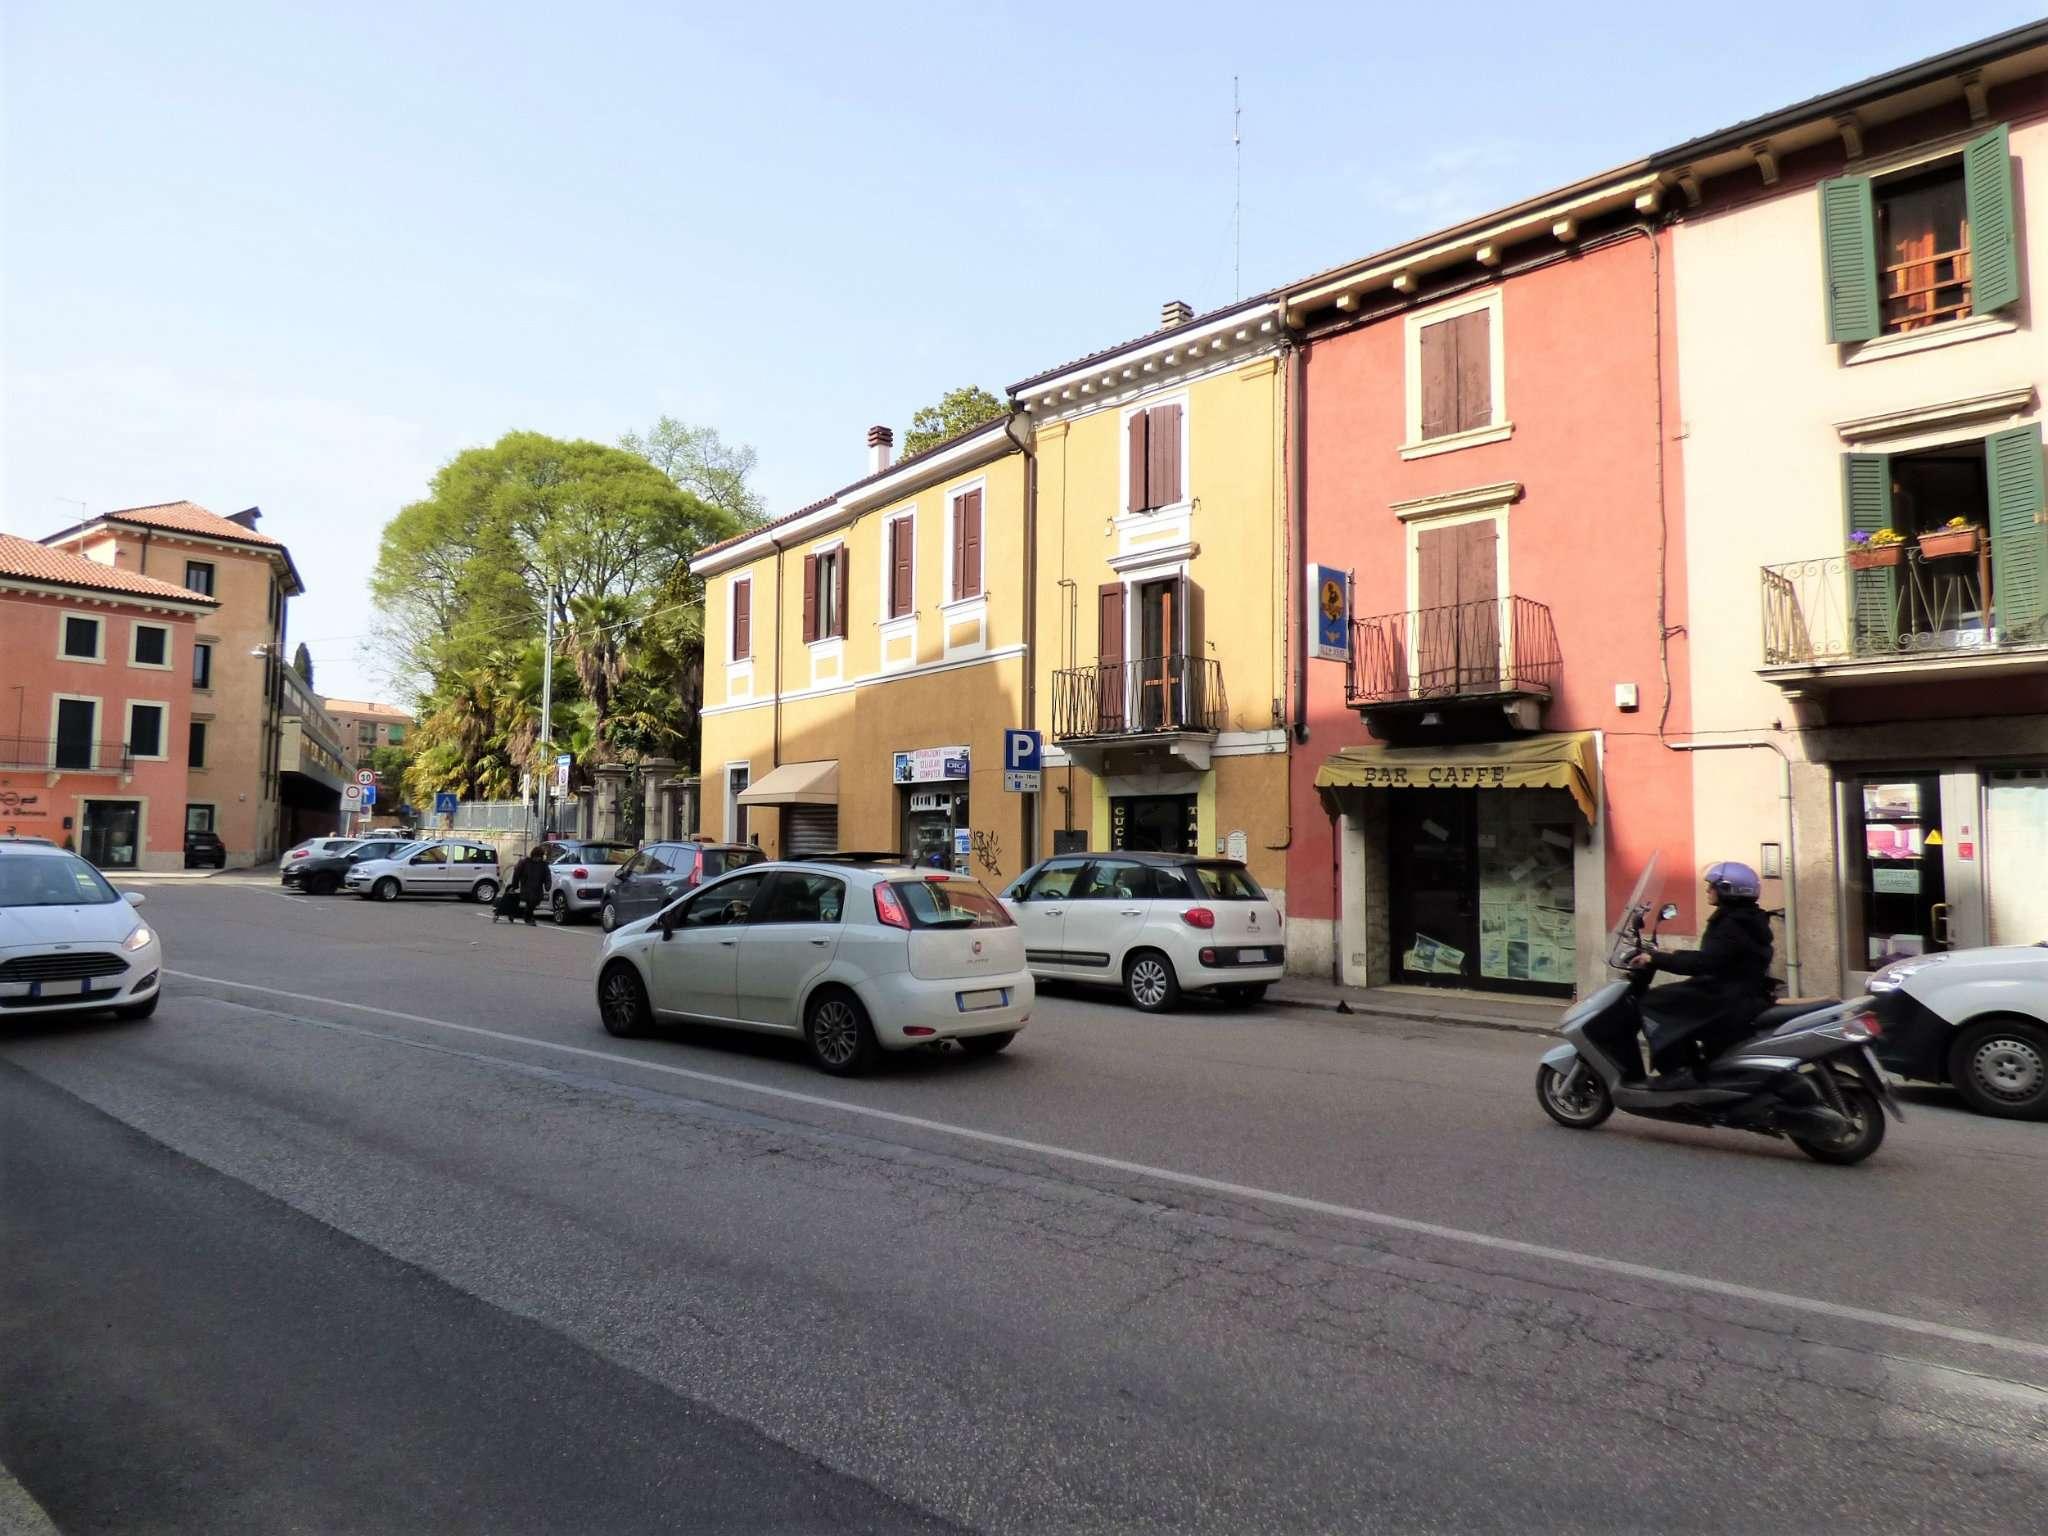 Stabile Intero - Palazzo, Borgo trento, Vendita - Verona